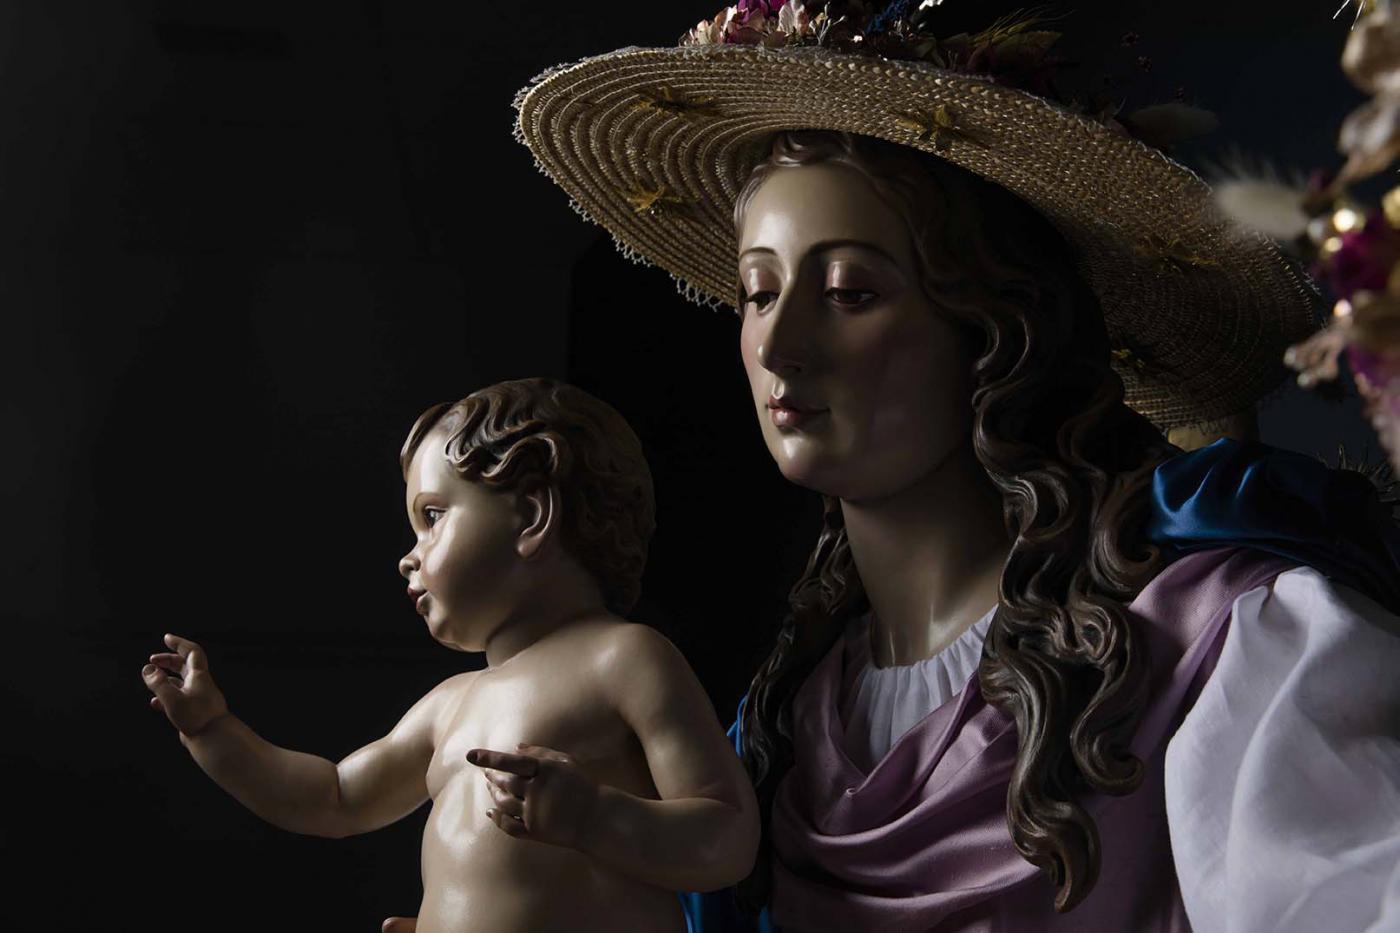 Imagen de la Divina Pastora de las Almas de Cártama